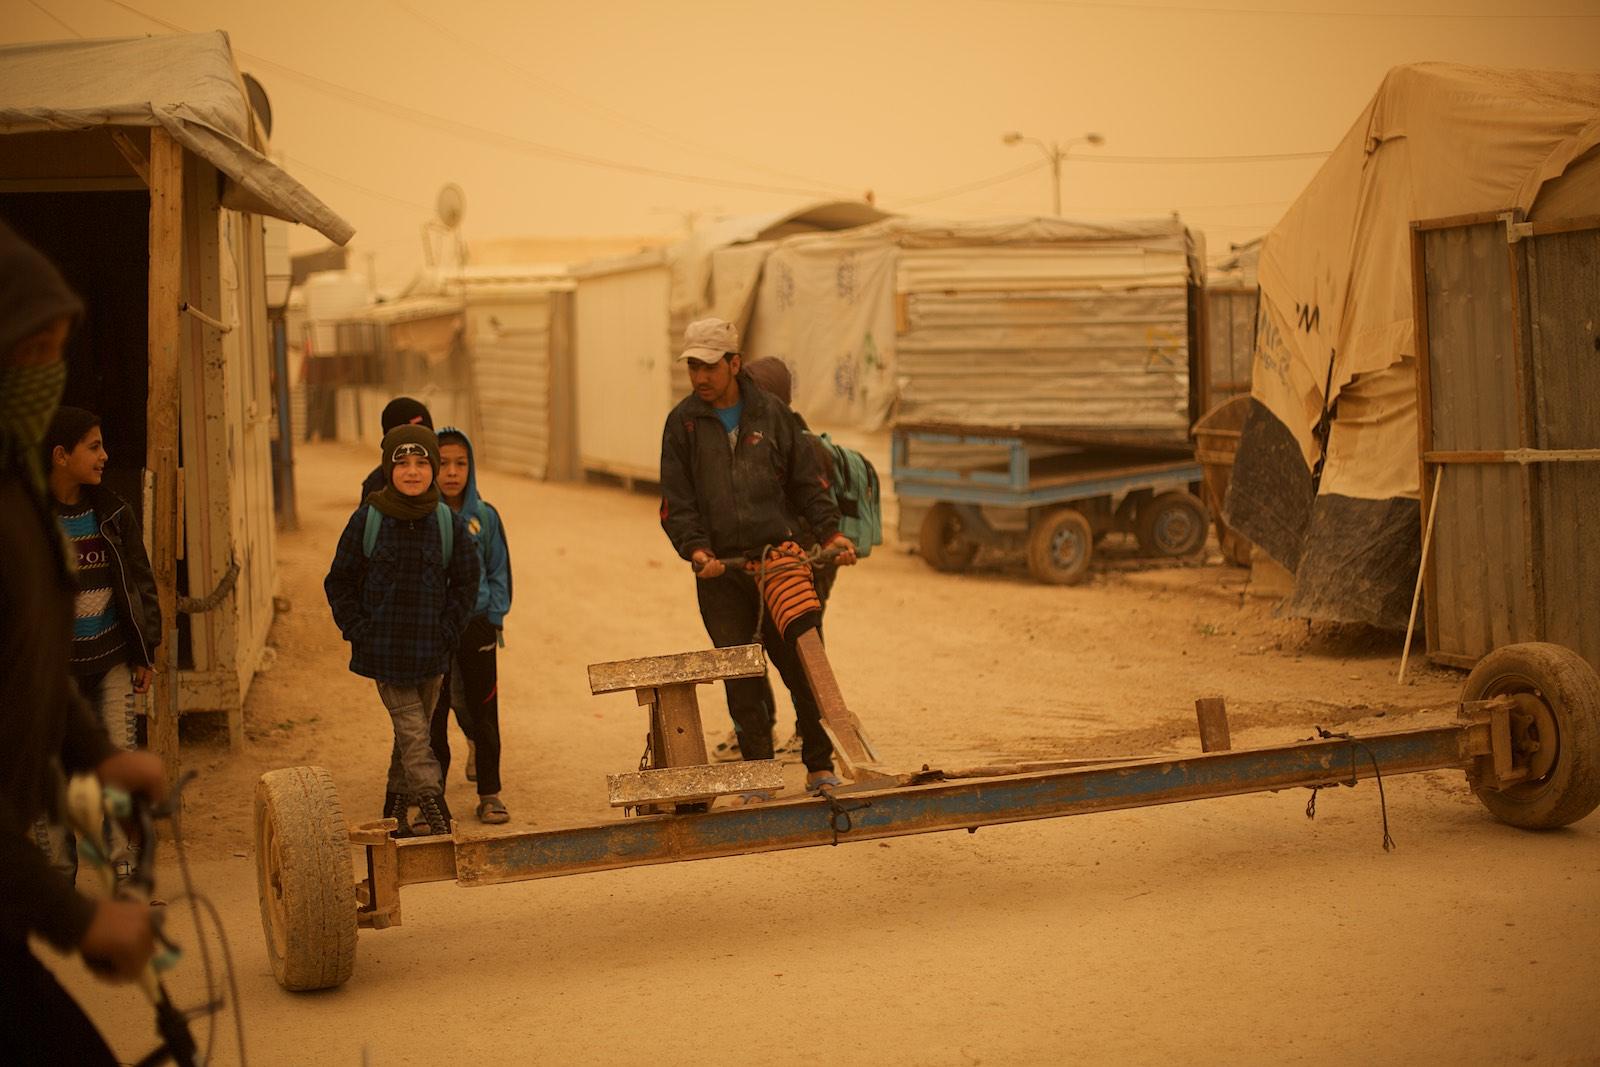 denis-bosnic-zaatari-jordan-refugee-camp-19.jpg